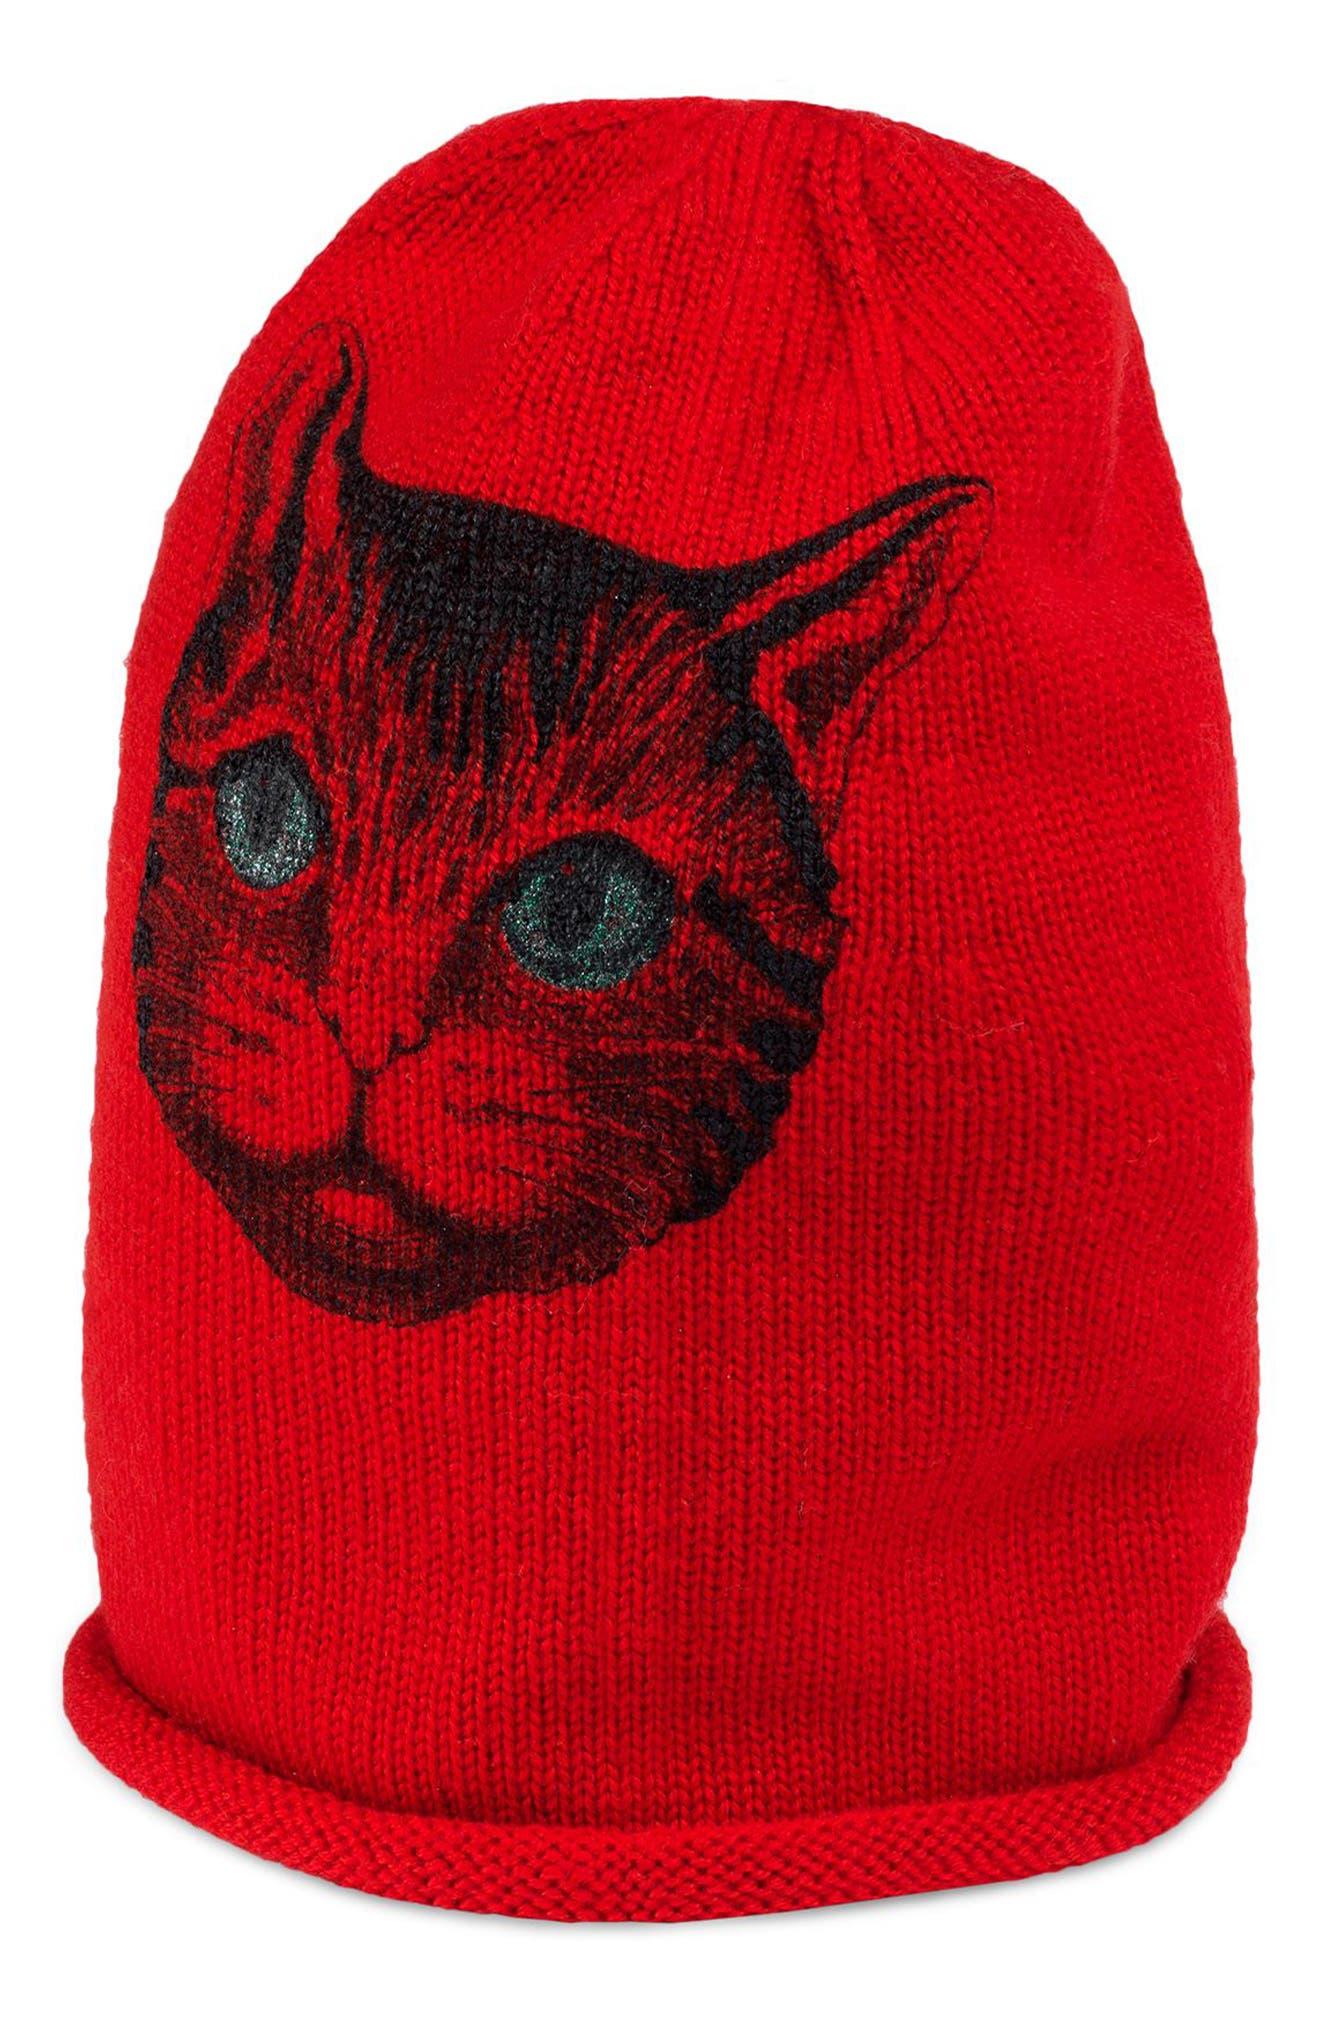 Catty Beanie,                         Main,                         color, 600